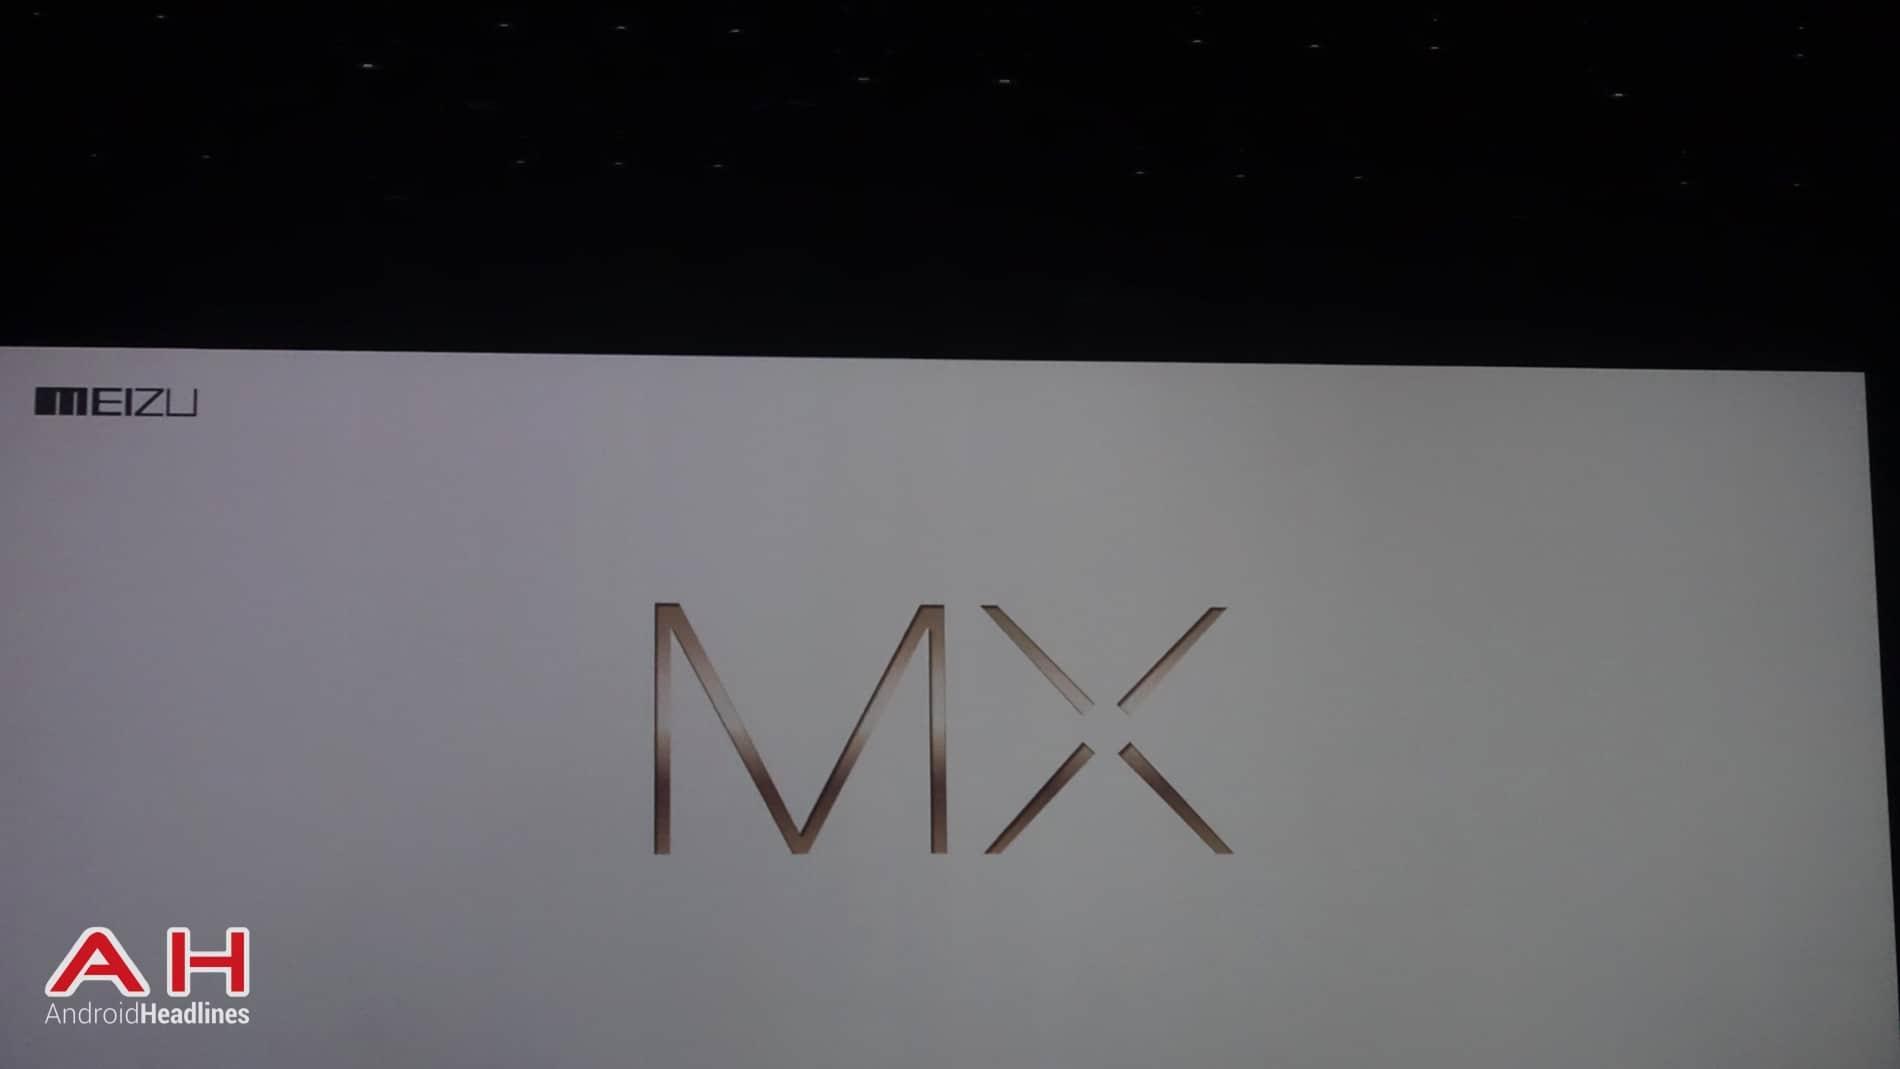 Meizu 630 MX5 AH 05